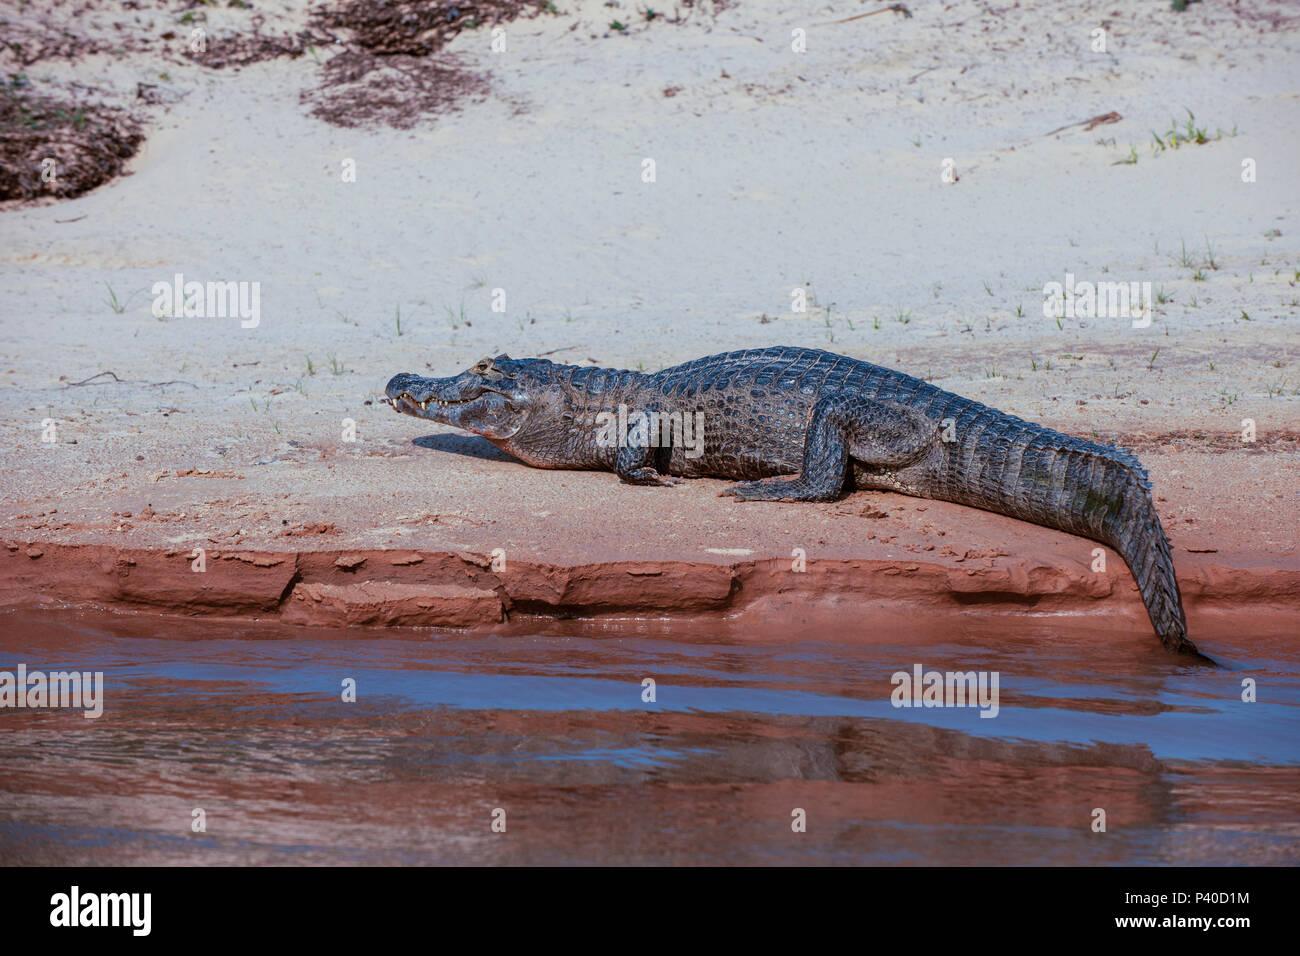 A caiman resting on the edge of the Sao Lourenco river, Pntanal - Stock Image